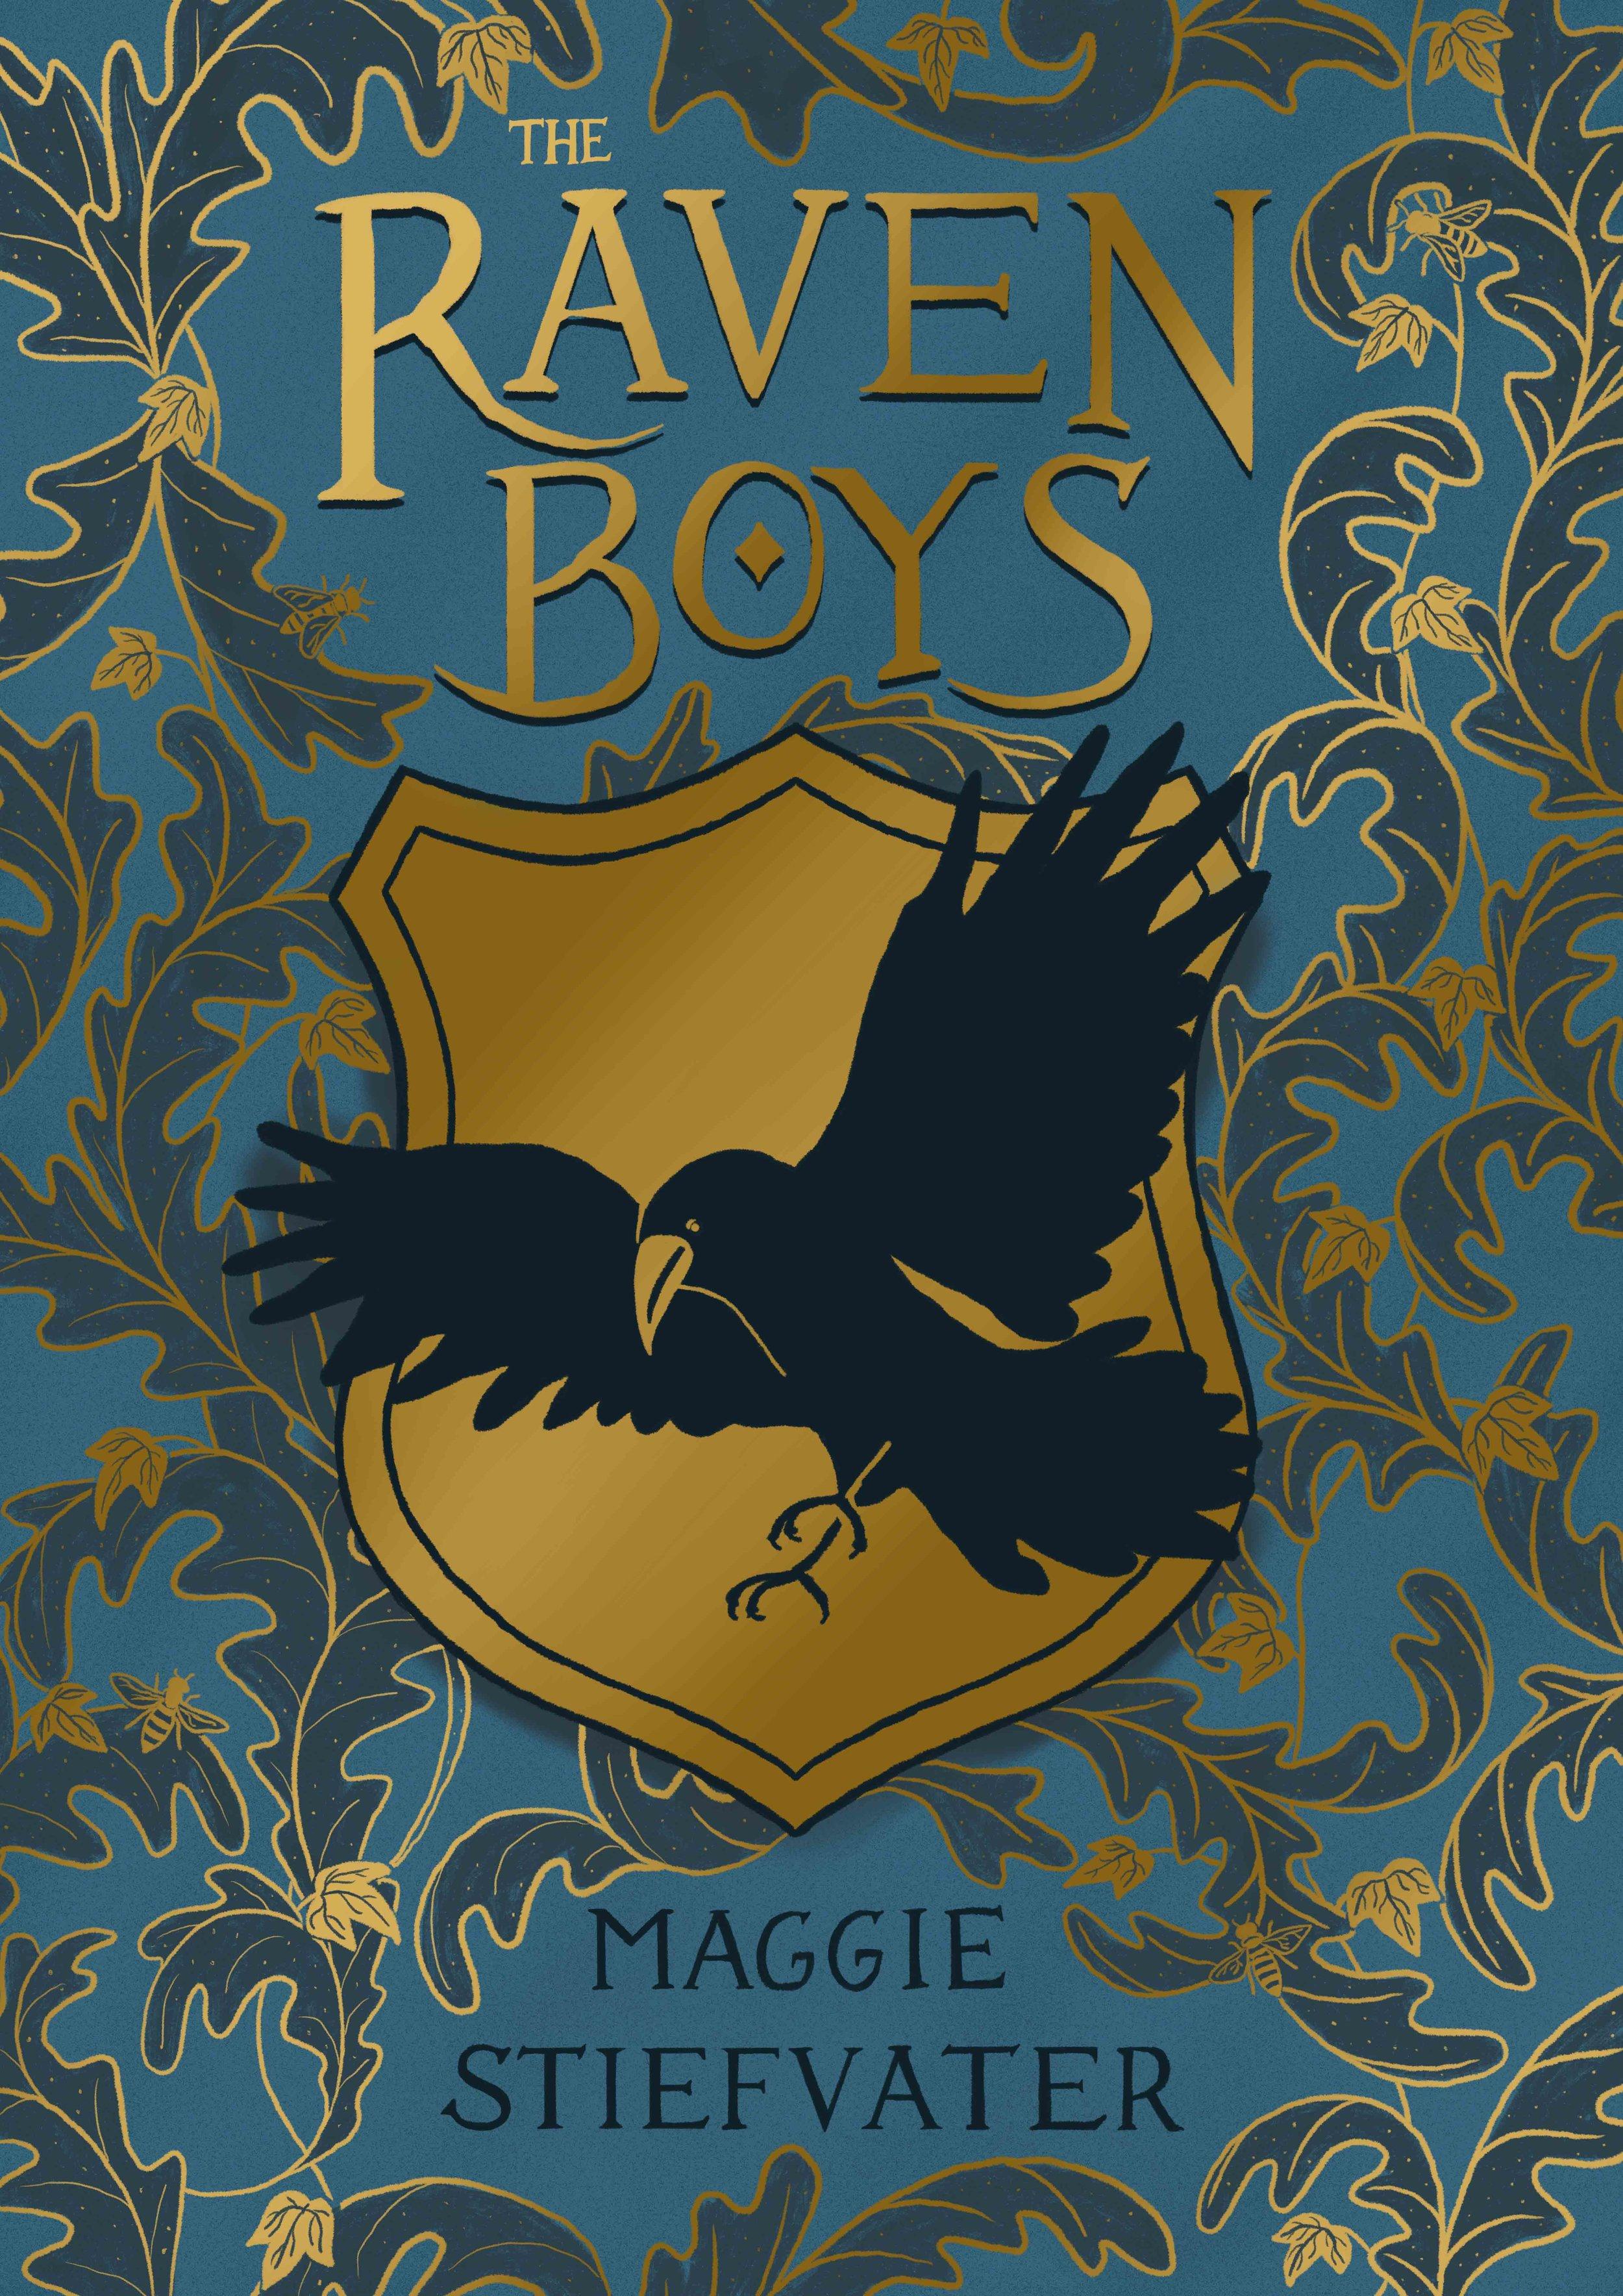 Raven_Boys small.jpg